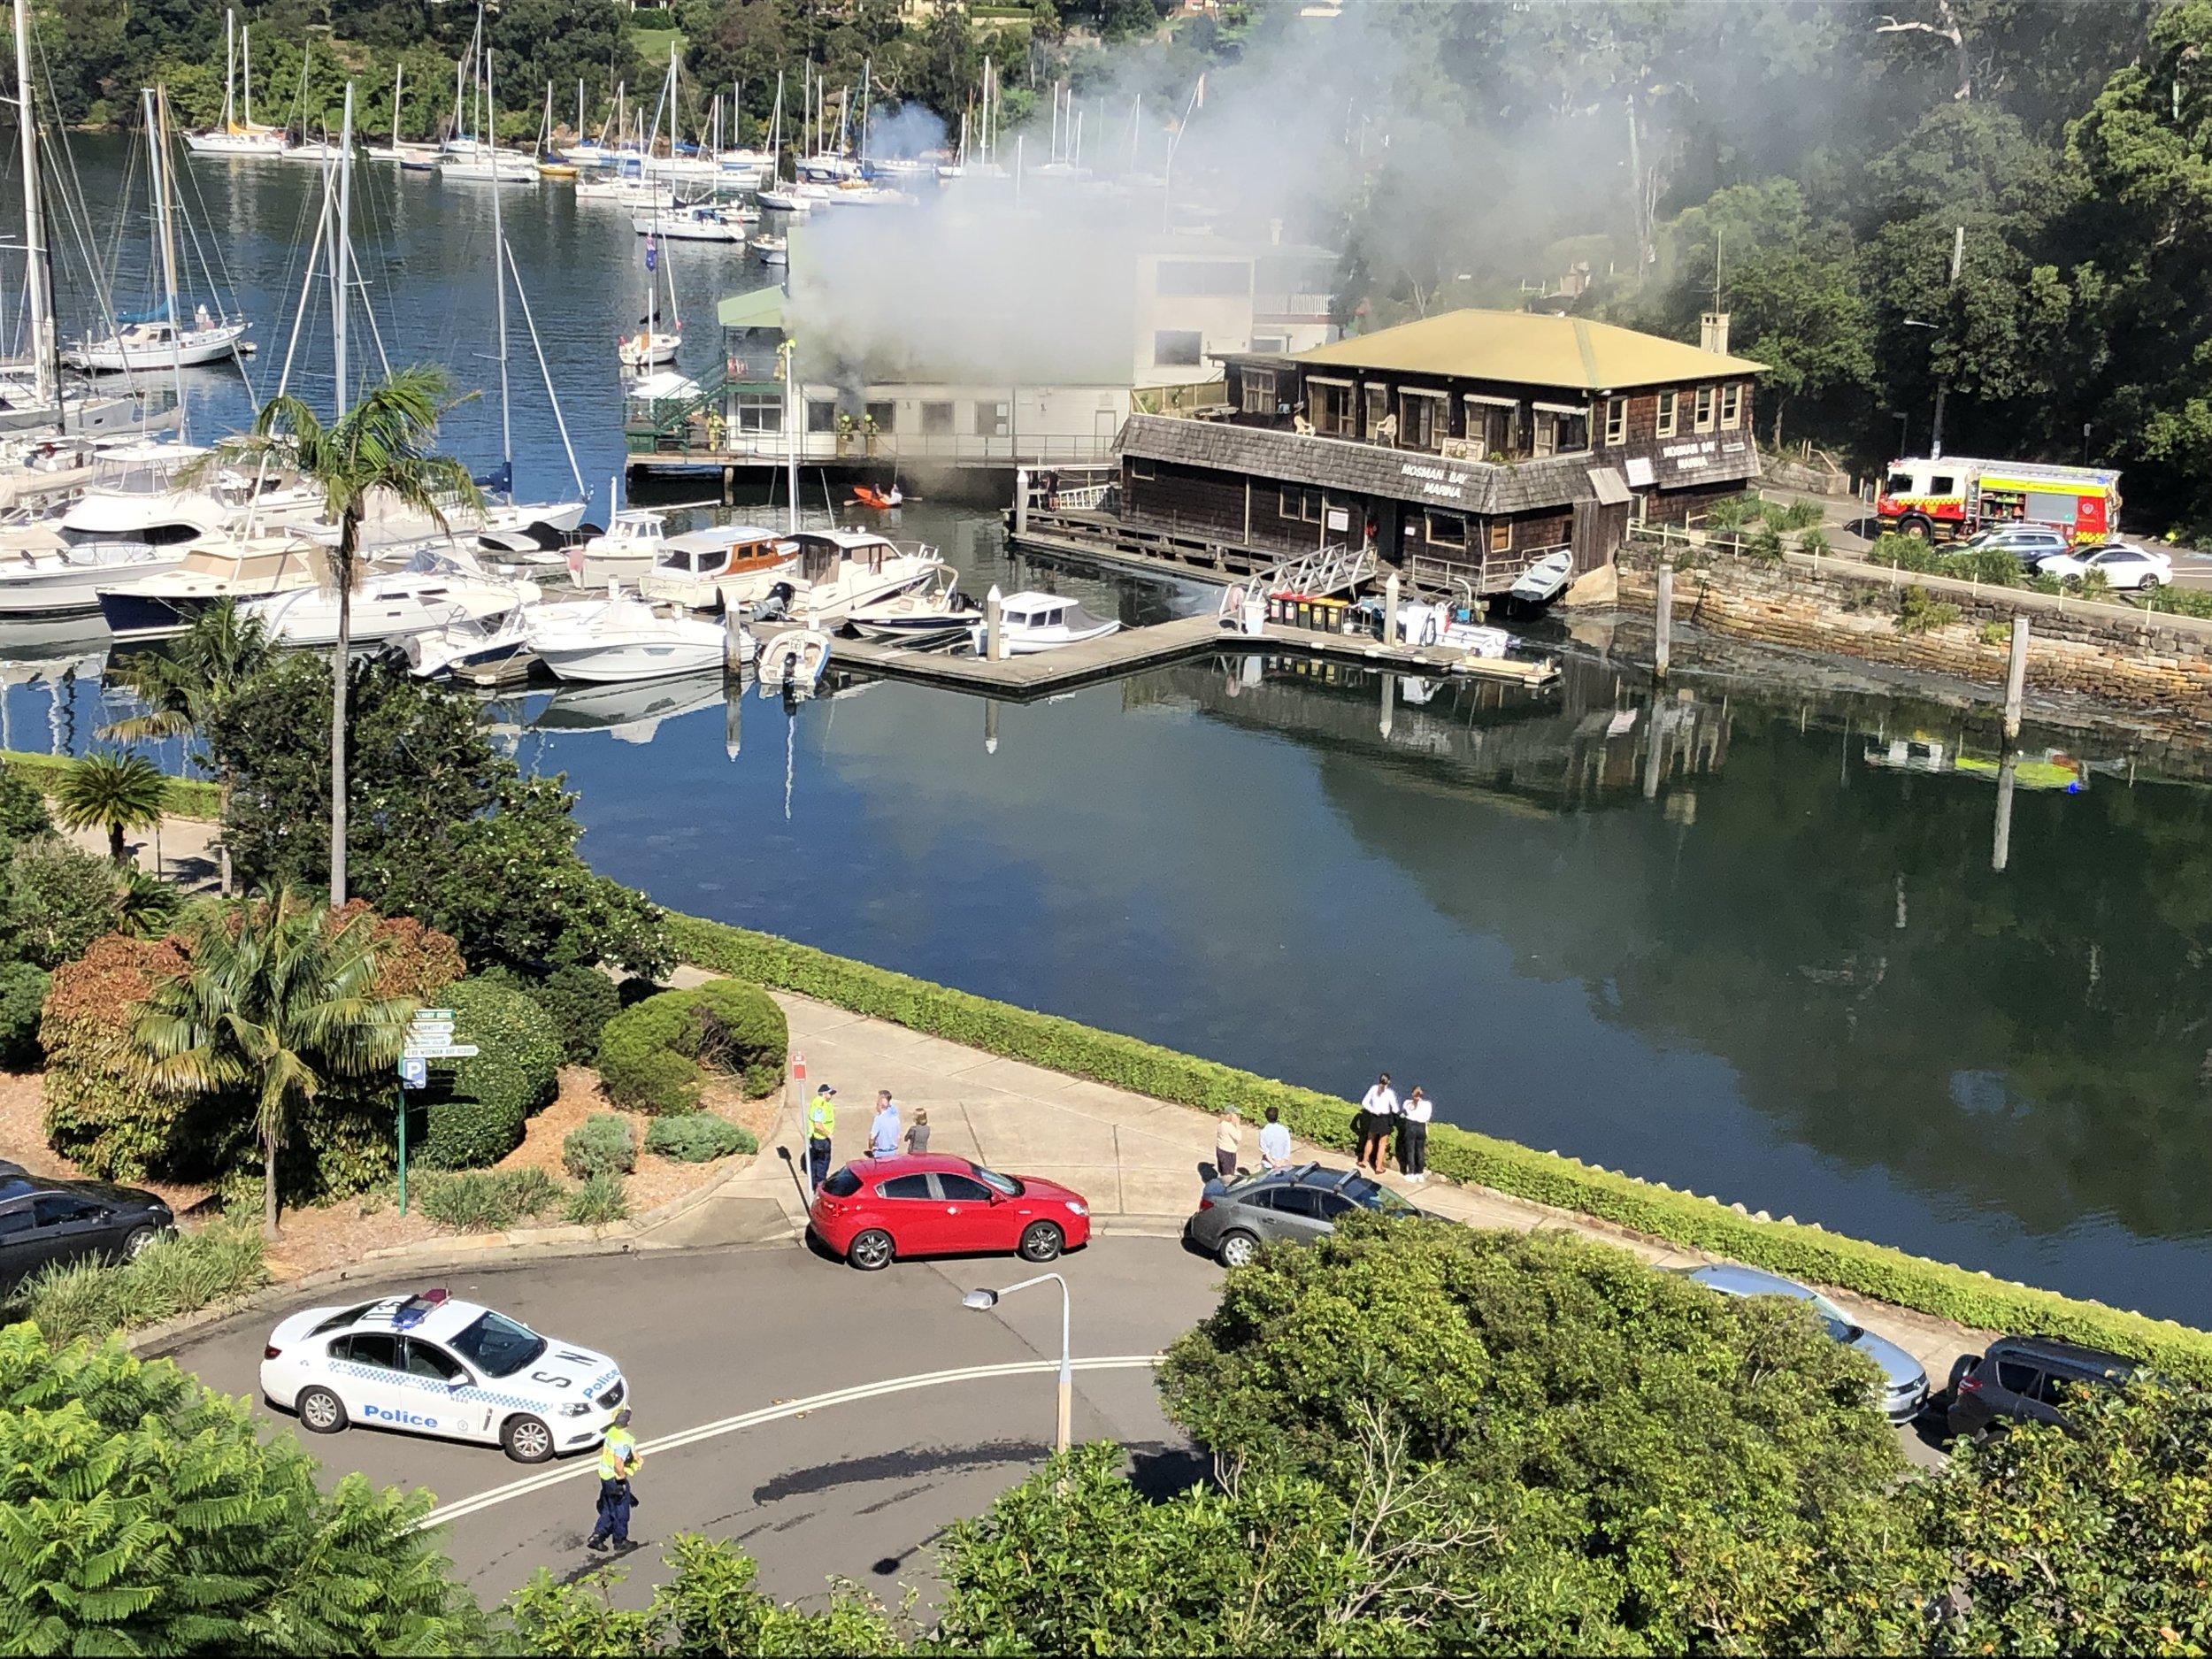 Mosman Rowers Fire